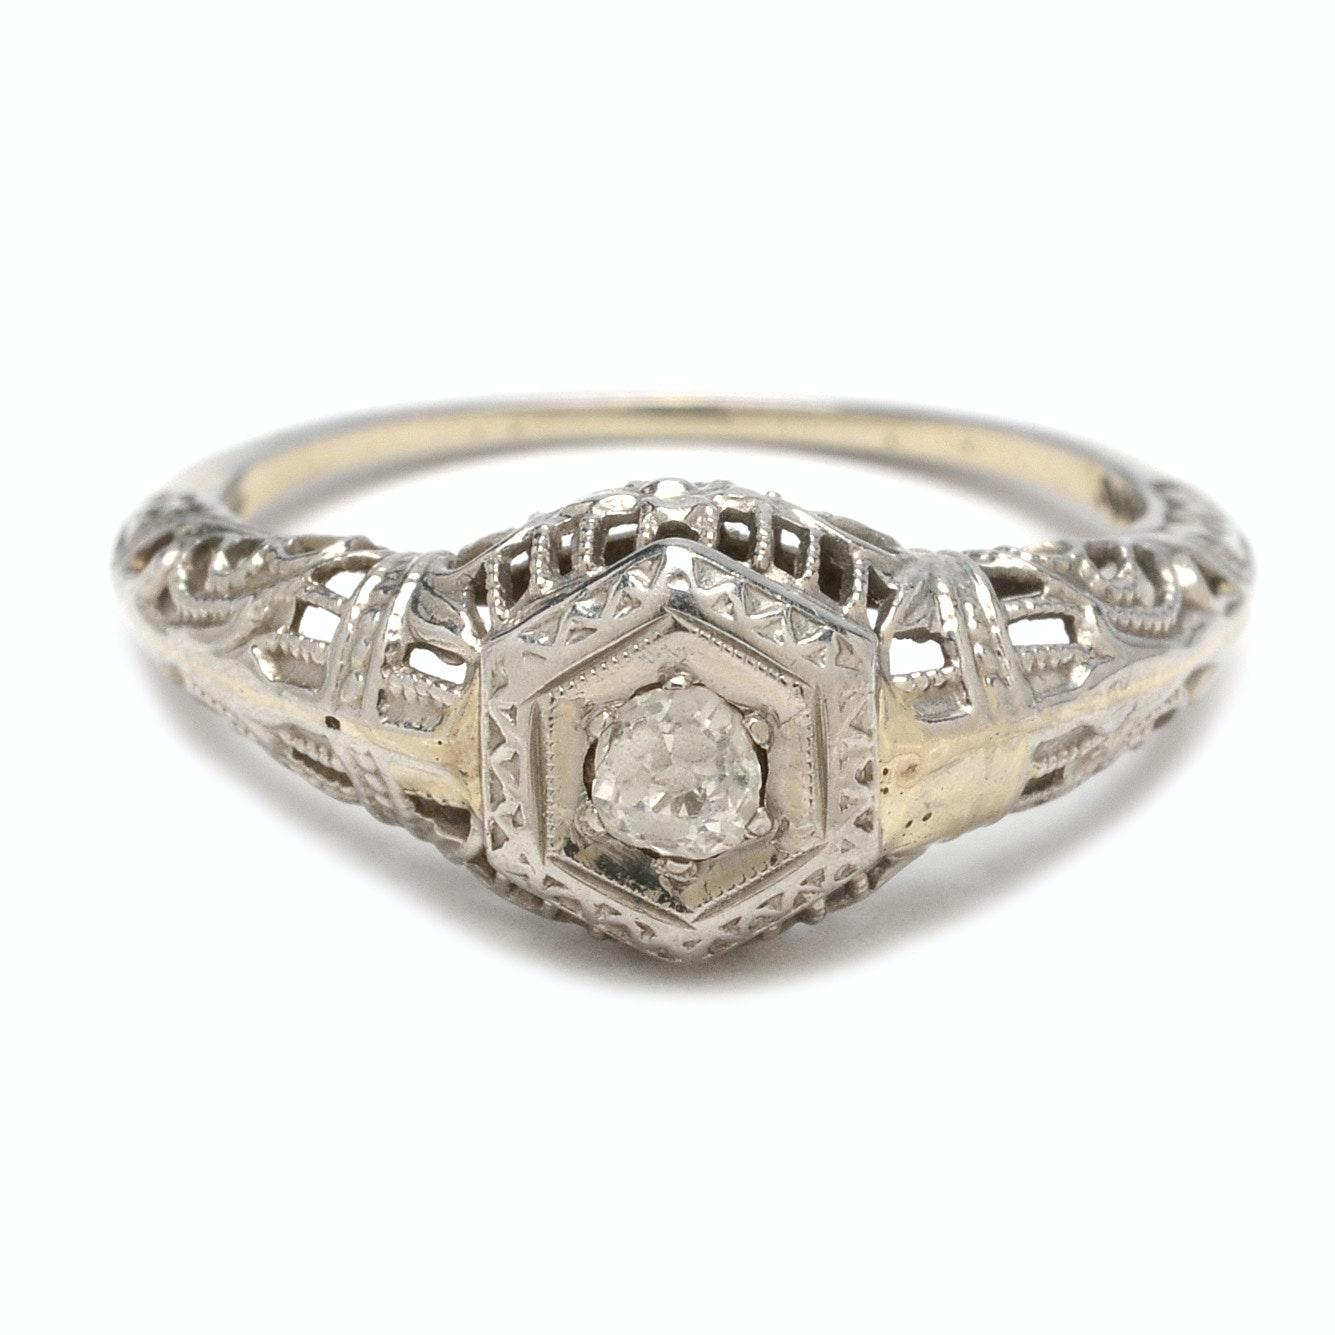 Late Edwardian 18K White Gold European Cut Diamond Ring